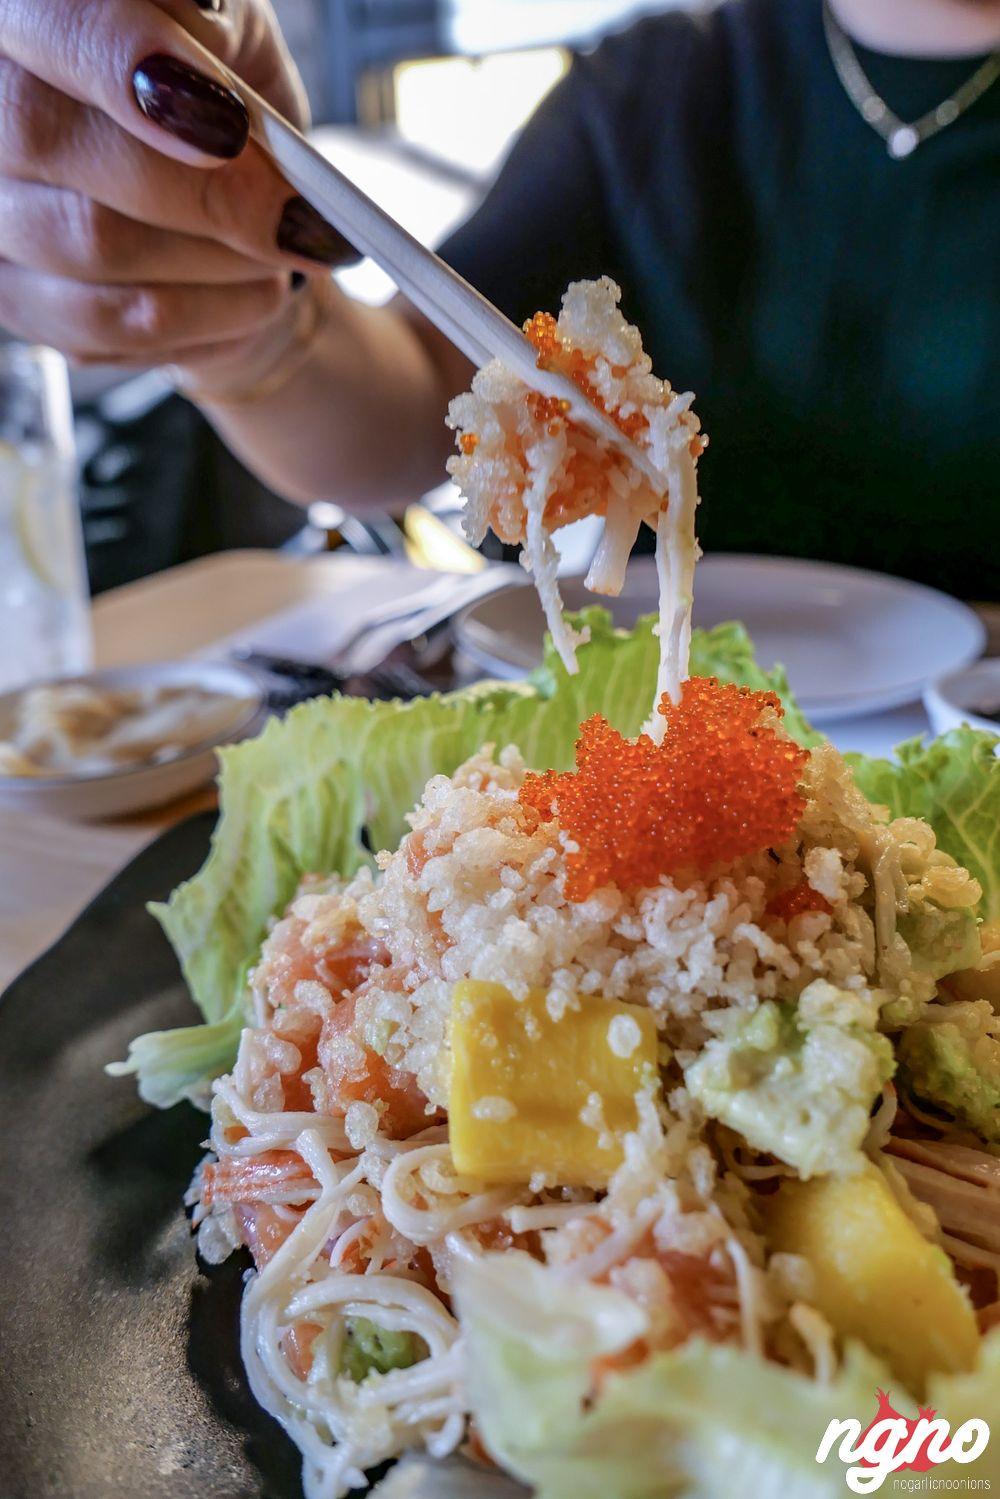 saigon-asian-restaurant-naccache-nogarlicnoonions-812018-12-25-08-24-46